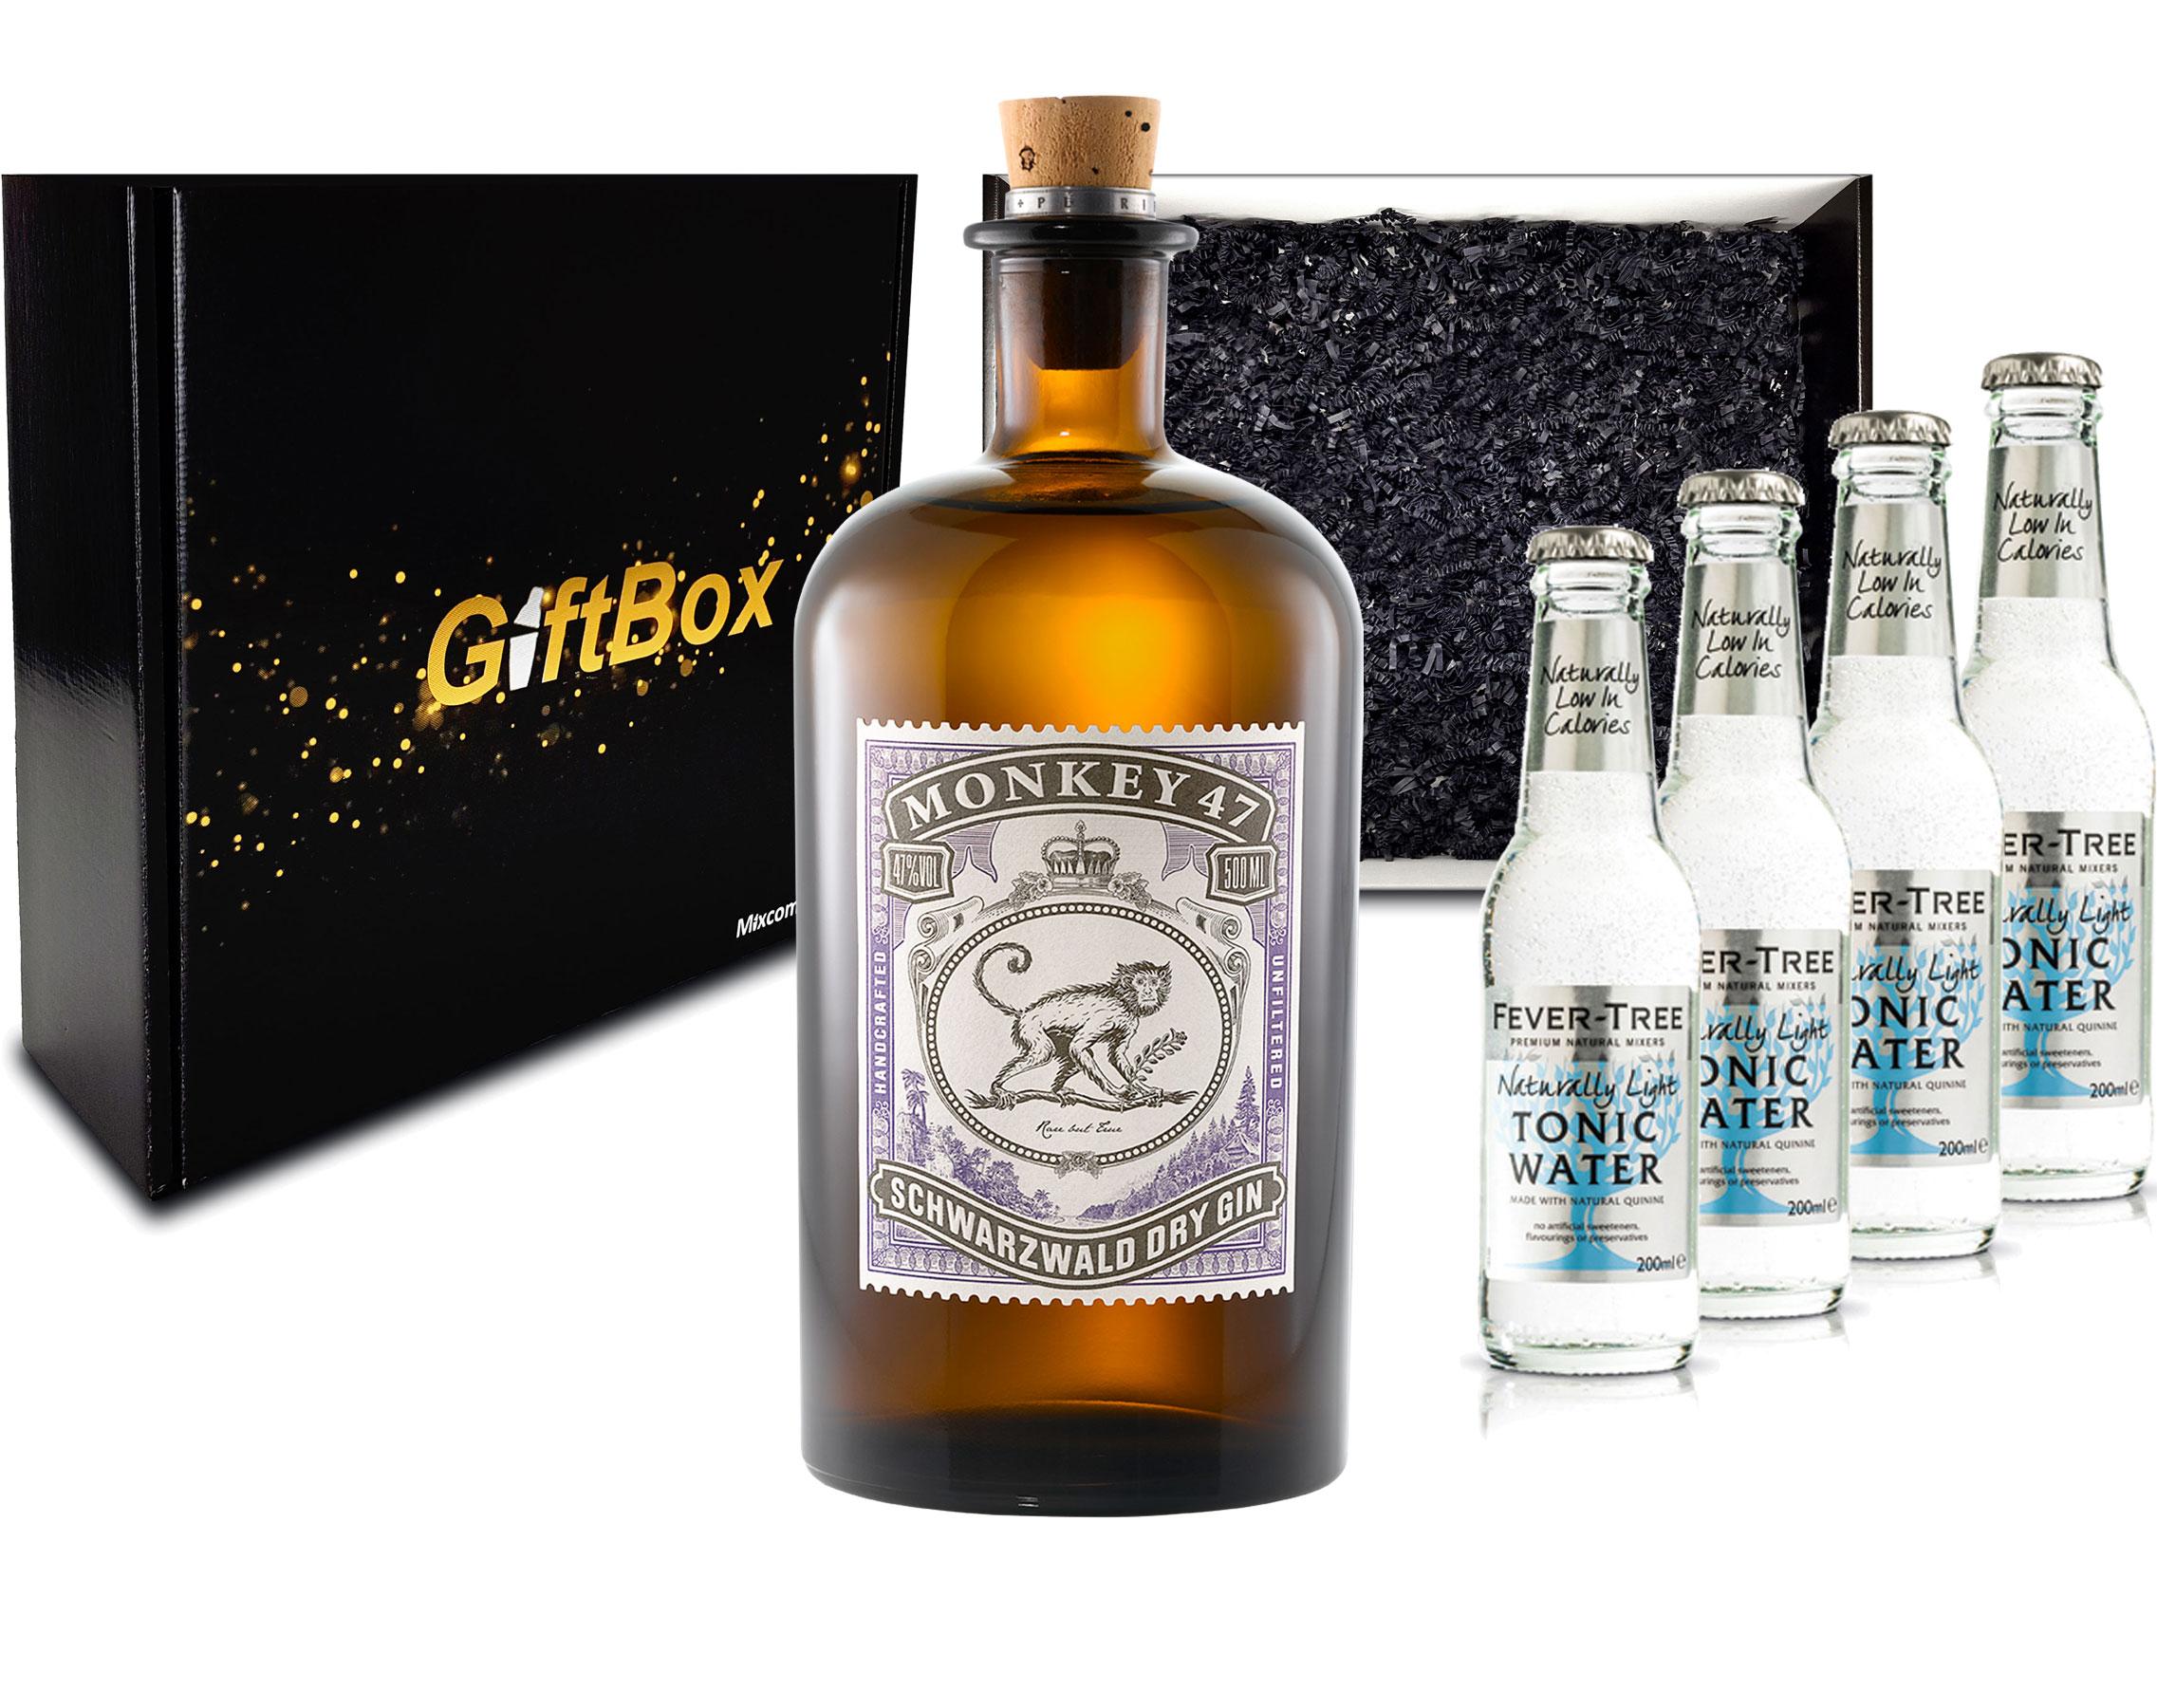 Gin Tonic Giftbox Geschenkset - Monkey 47 Schwarzwald Gin 0,5l (47% Vol) + 4x Fever Tree Naturally Light Tonic Water 200ml inkl. Pfand MEHRWEG -[Enthält Sulfite]